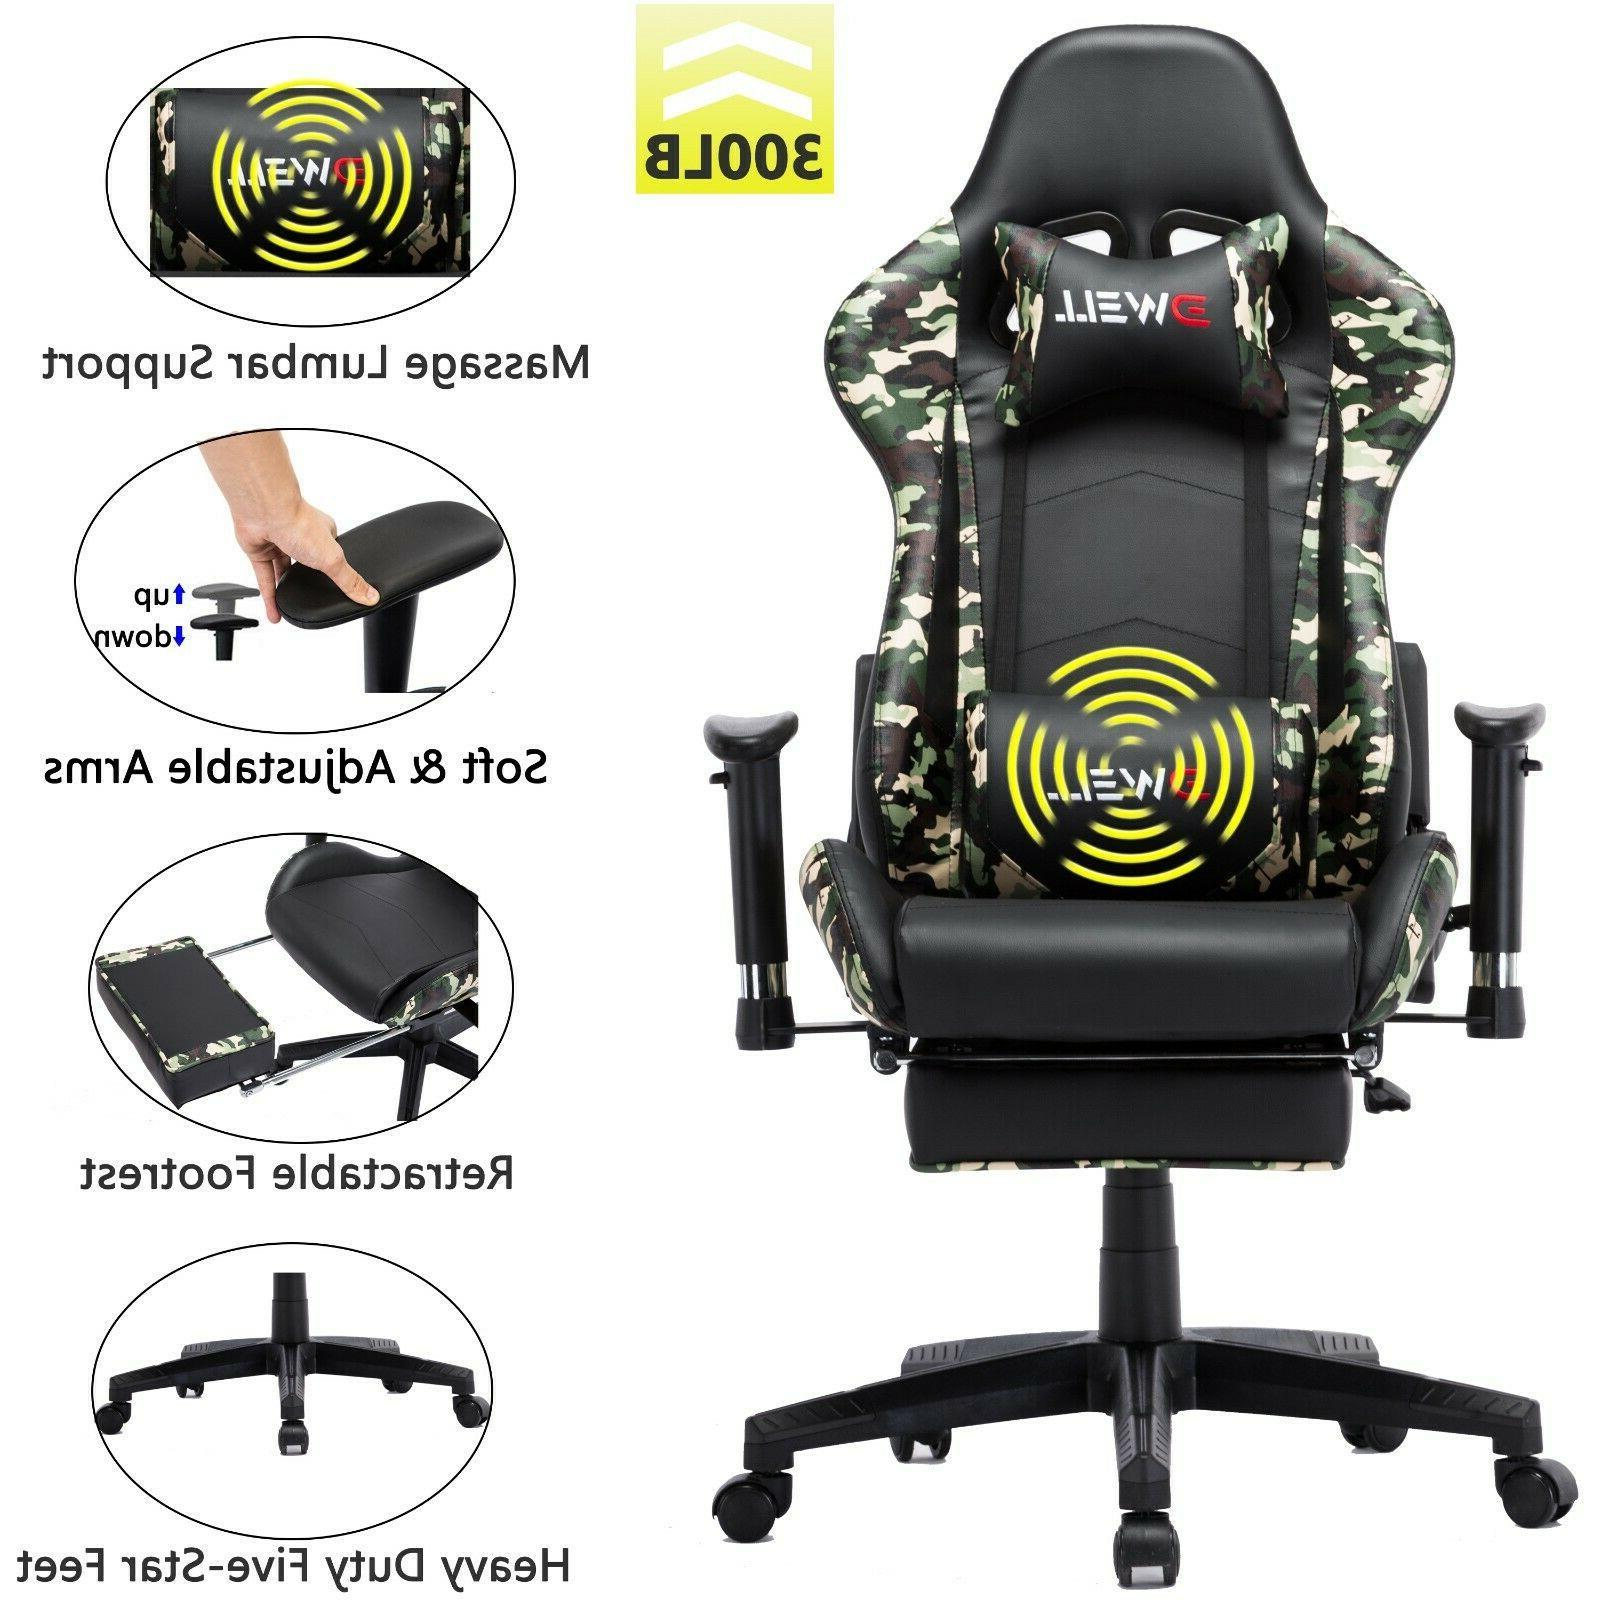 Ergonomic Chair with Footrest Lumbar Massage Support